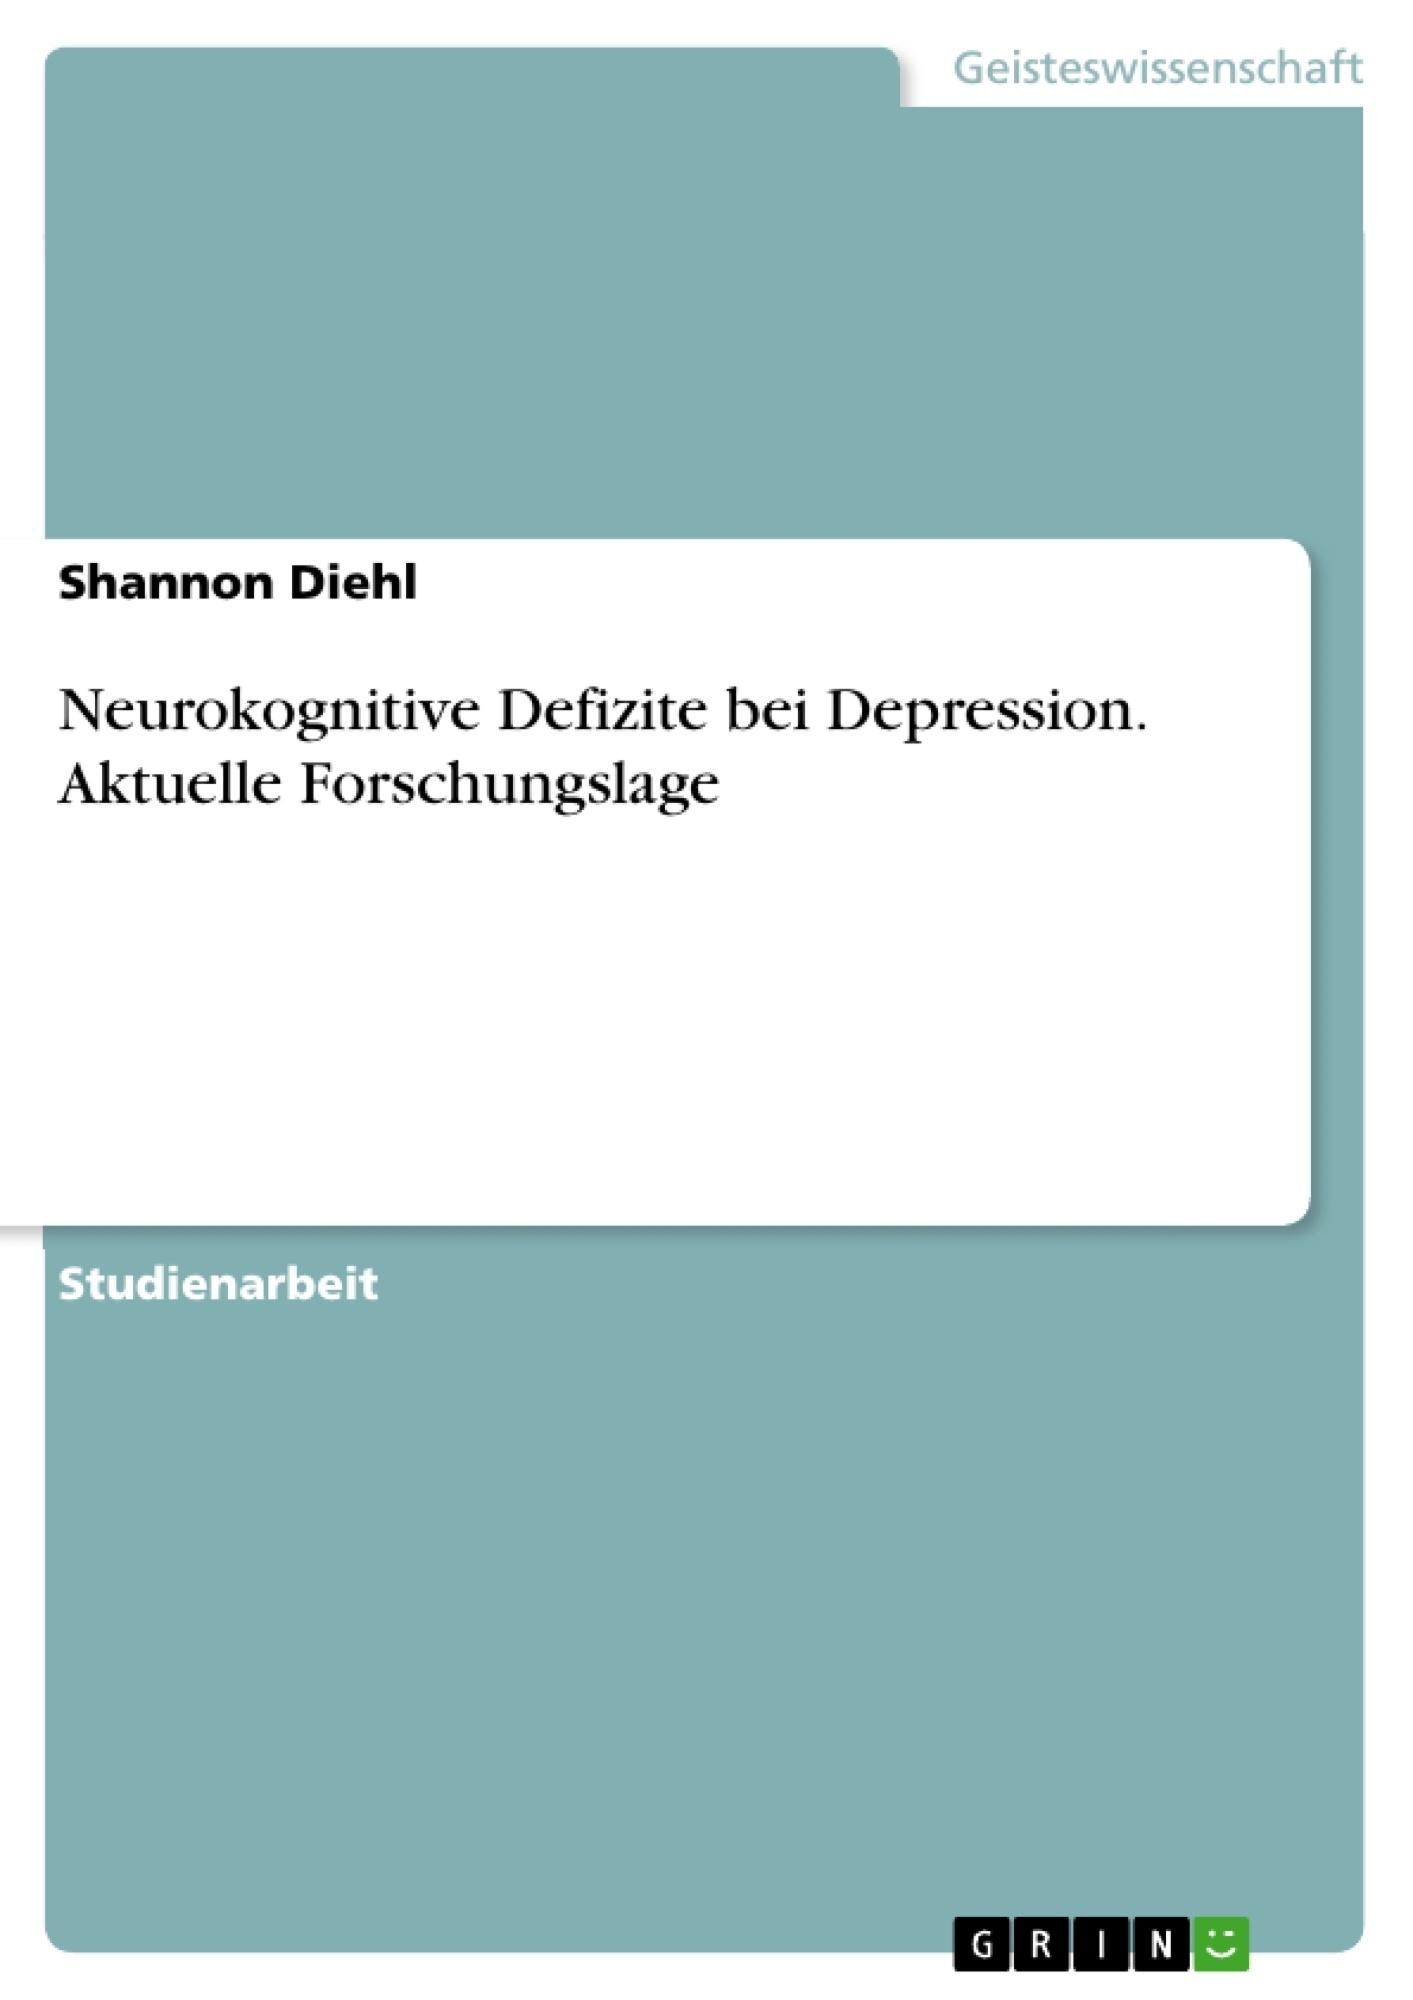 Titel: Neurokognitive Defizite bei Depression. Aktuelle Forschungslage